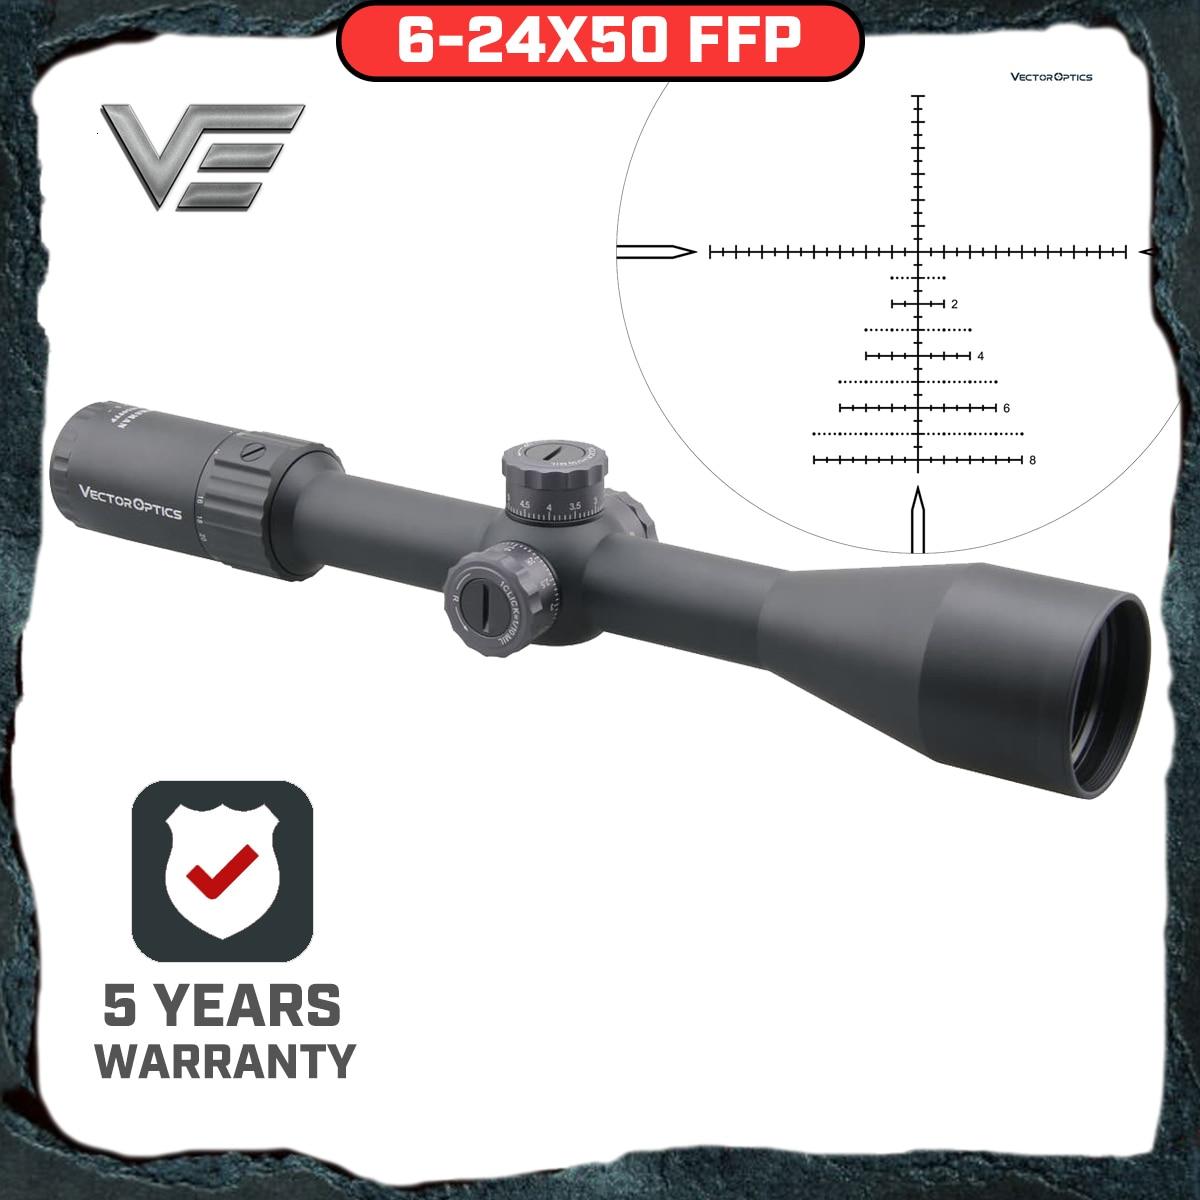 Vector Optics Marksman 6-24x50 FFP Tactical Riflescope Hunting Rifle Scope Side Focus Min 10Yds 1/10MIL Adjustment .30 06 Win